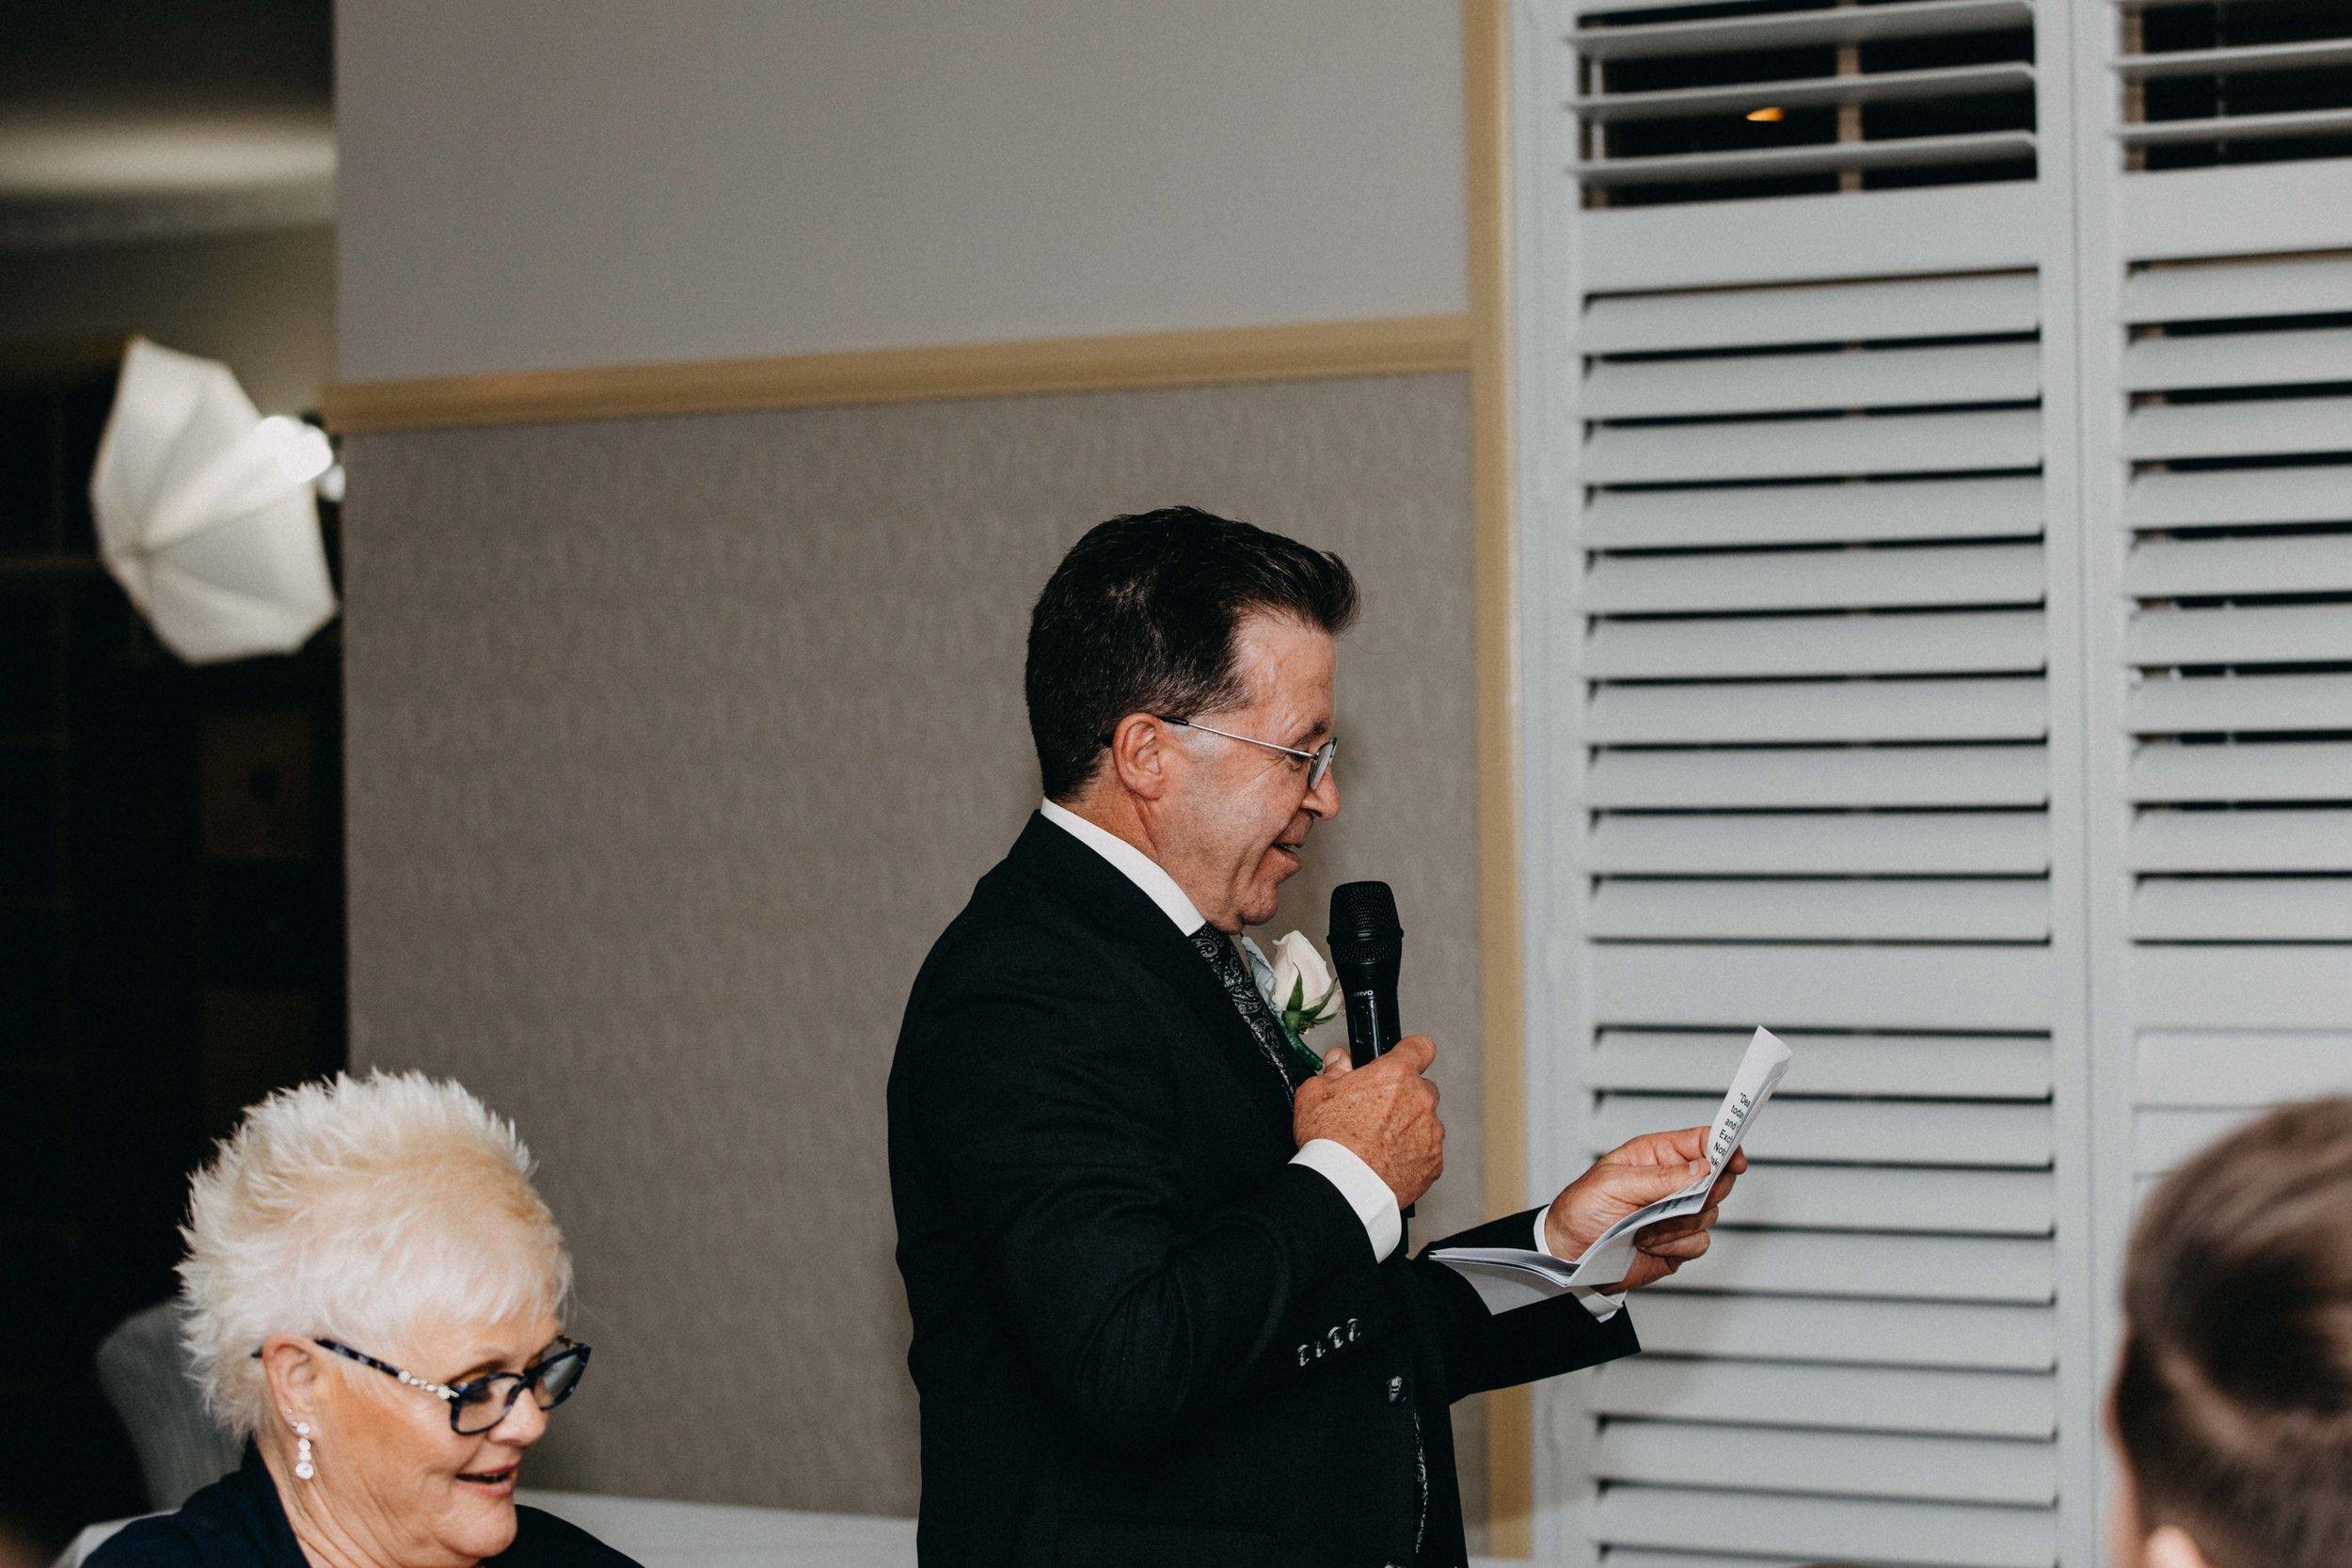 appin-house-wedding-macarthur-www.emilyobrienphotography.net-160.jpg